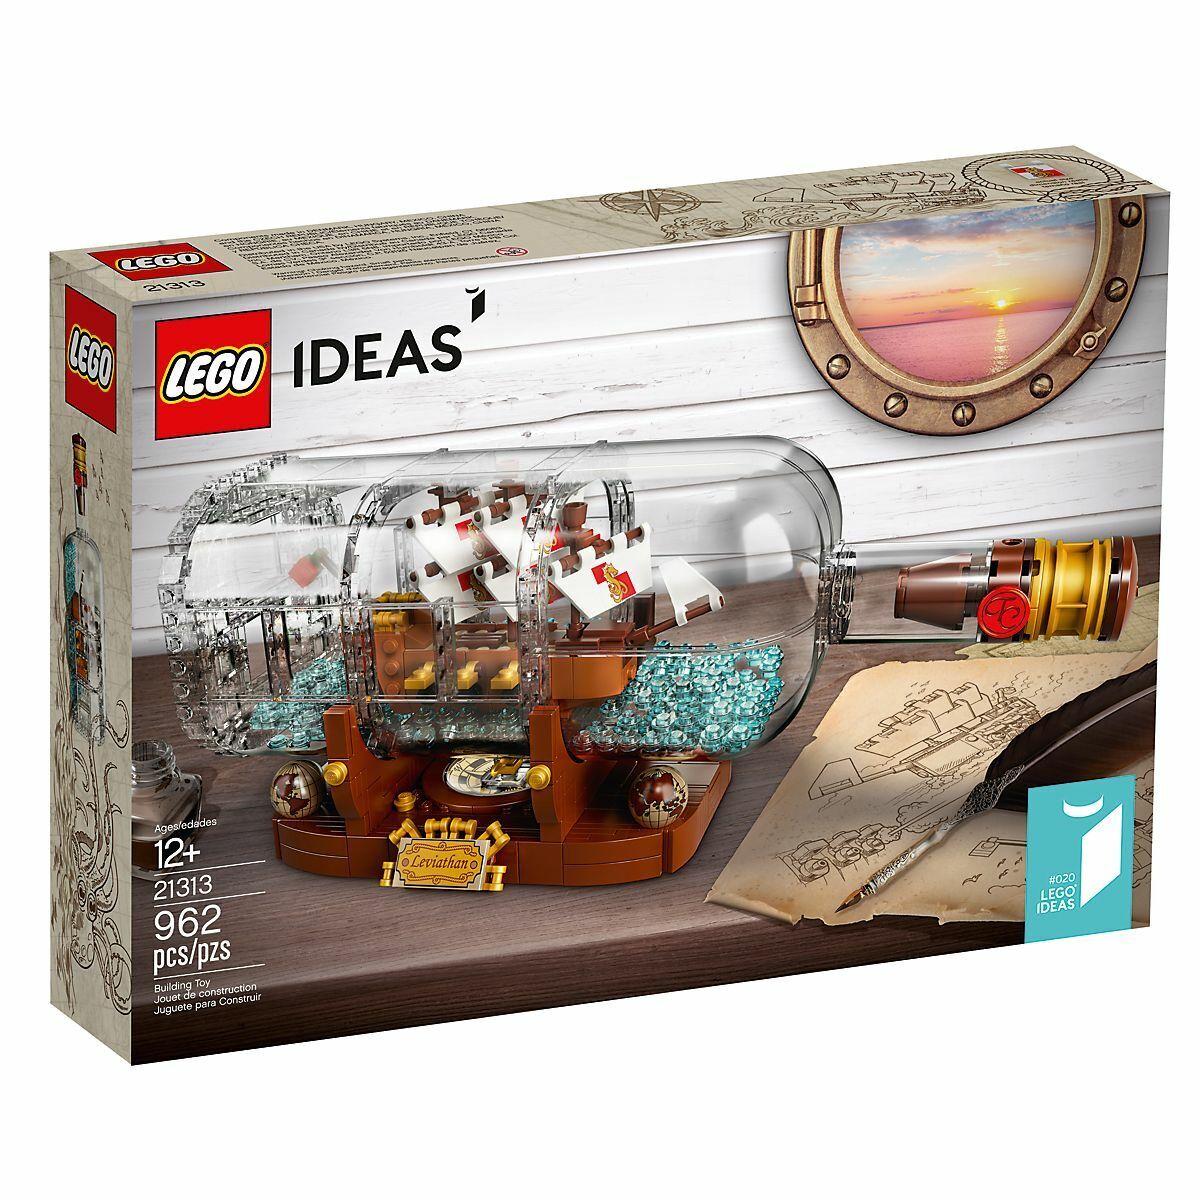 BRe nuovo  FACTORY SEALED LEGO IDEAS CUUSOO 21313 SHIP IN A BOTTLE  rivenditori online